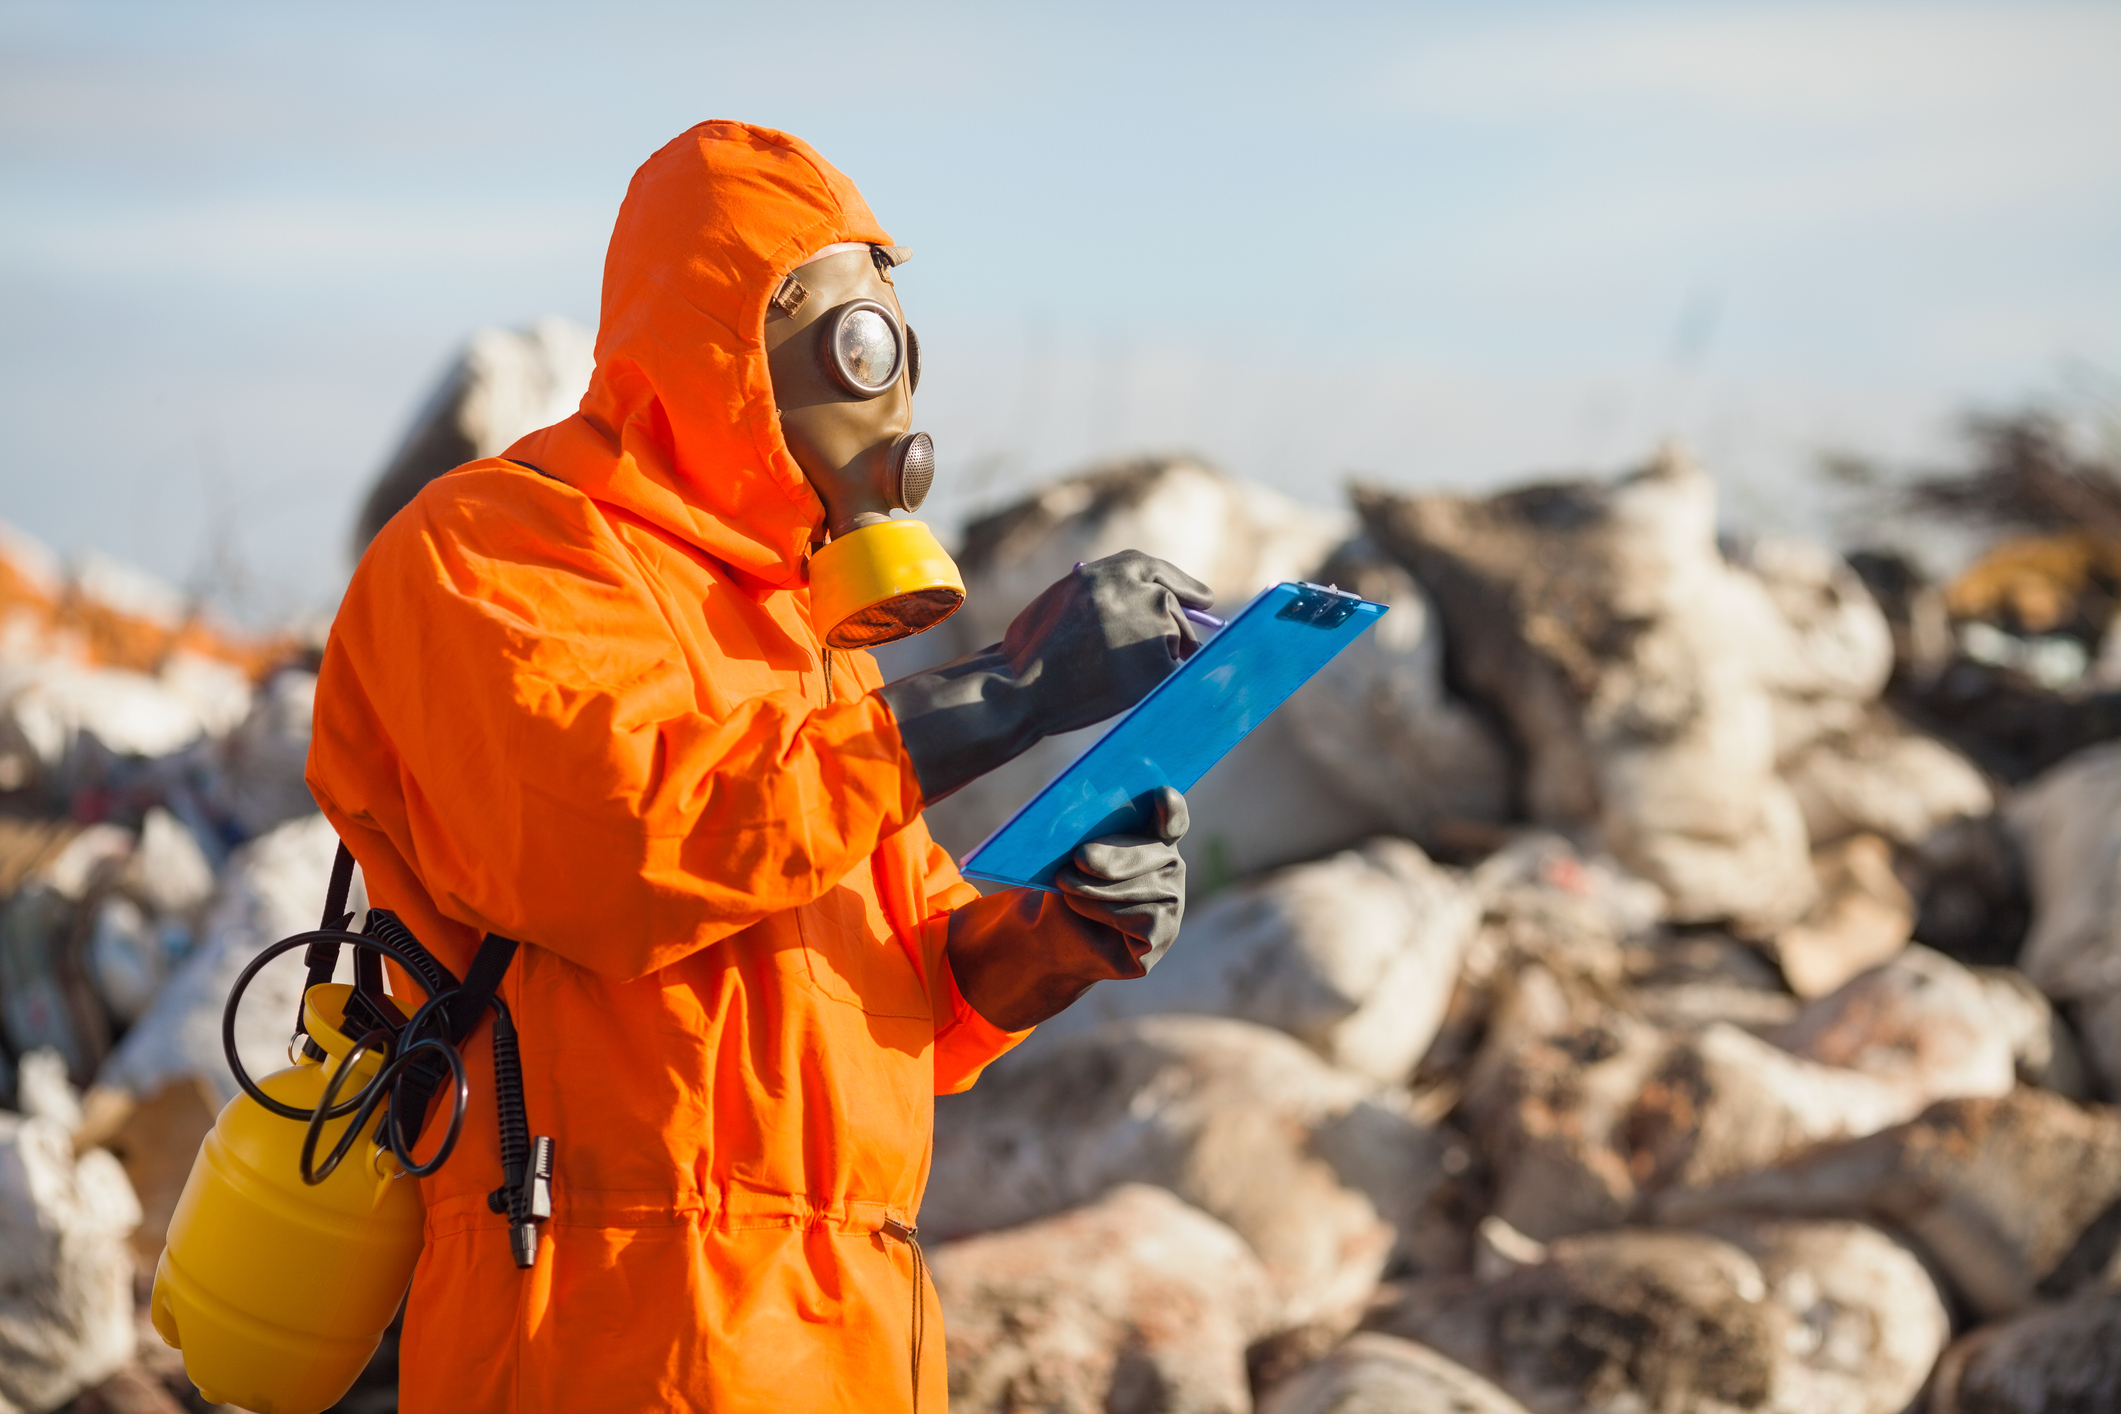 *click for details on hazardous waste site services